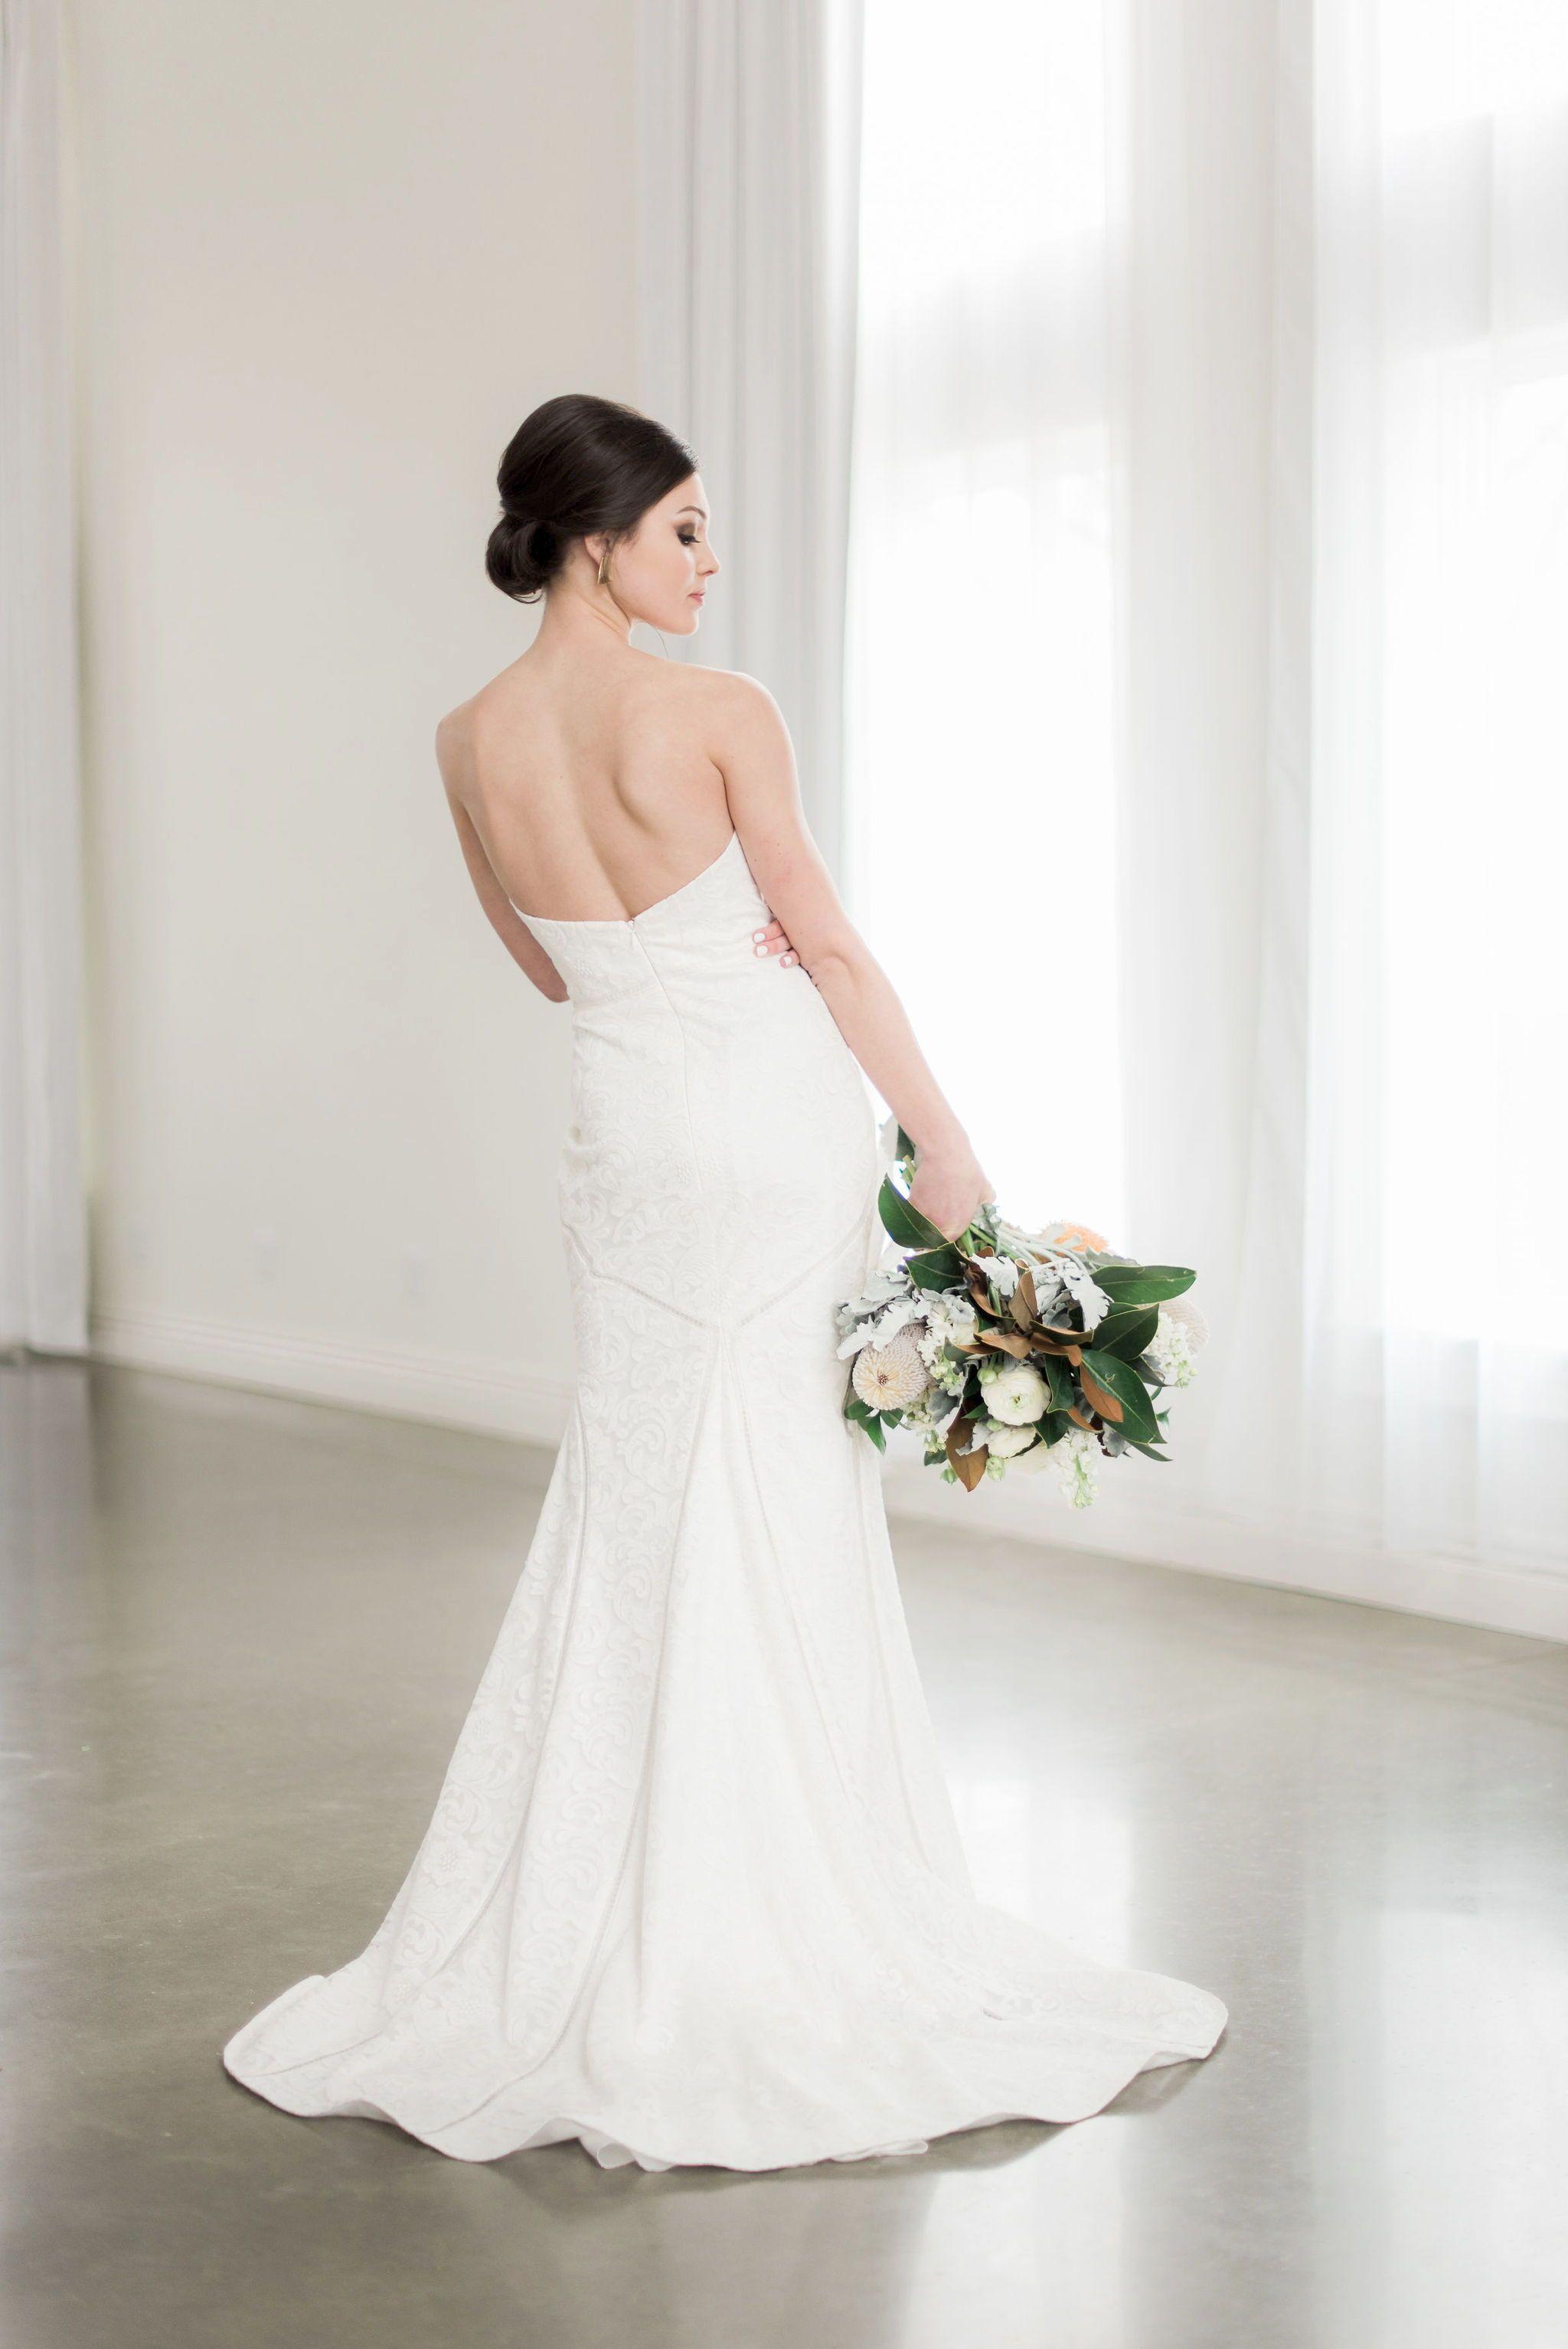 Desiree Hartsock Wedding Gown In 2020 Bridal Portrait Poses Bride Poses Bridal Portraits